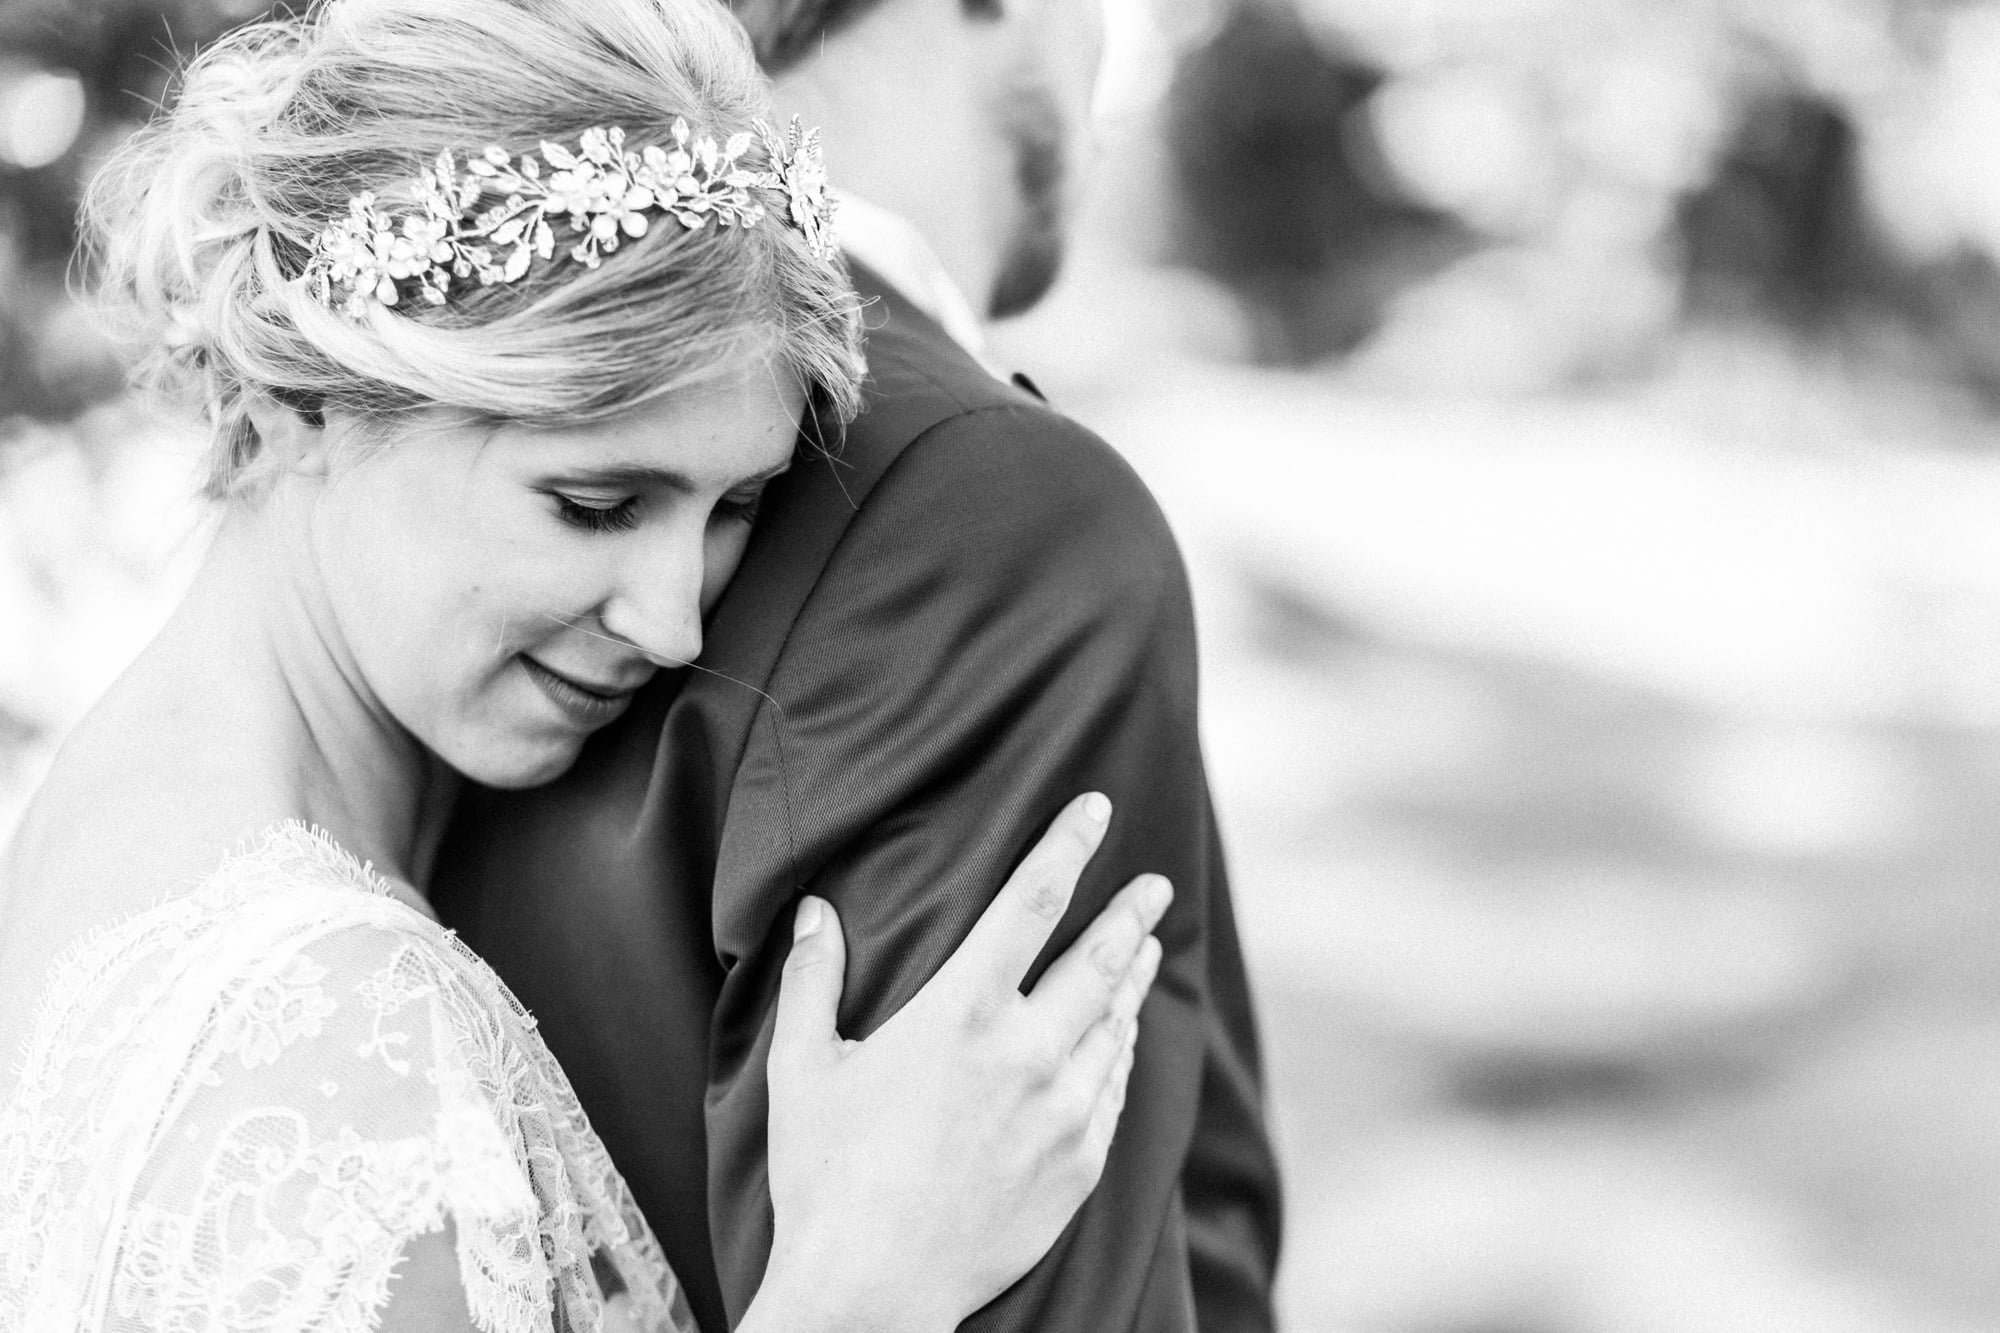 Diadem umarmung Braut schwarz weiß Bild